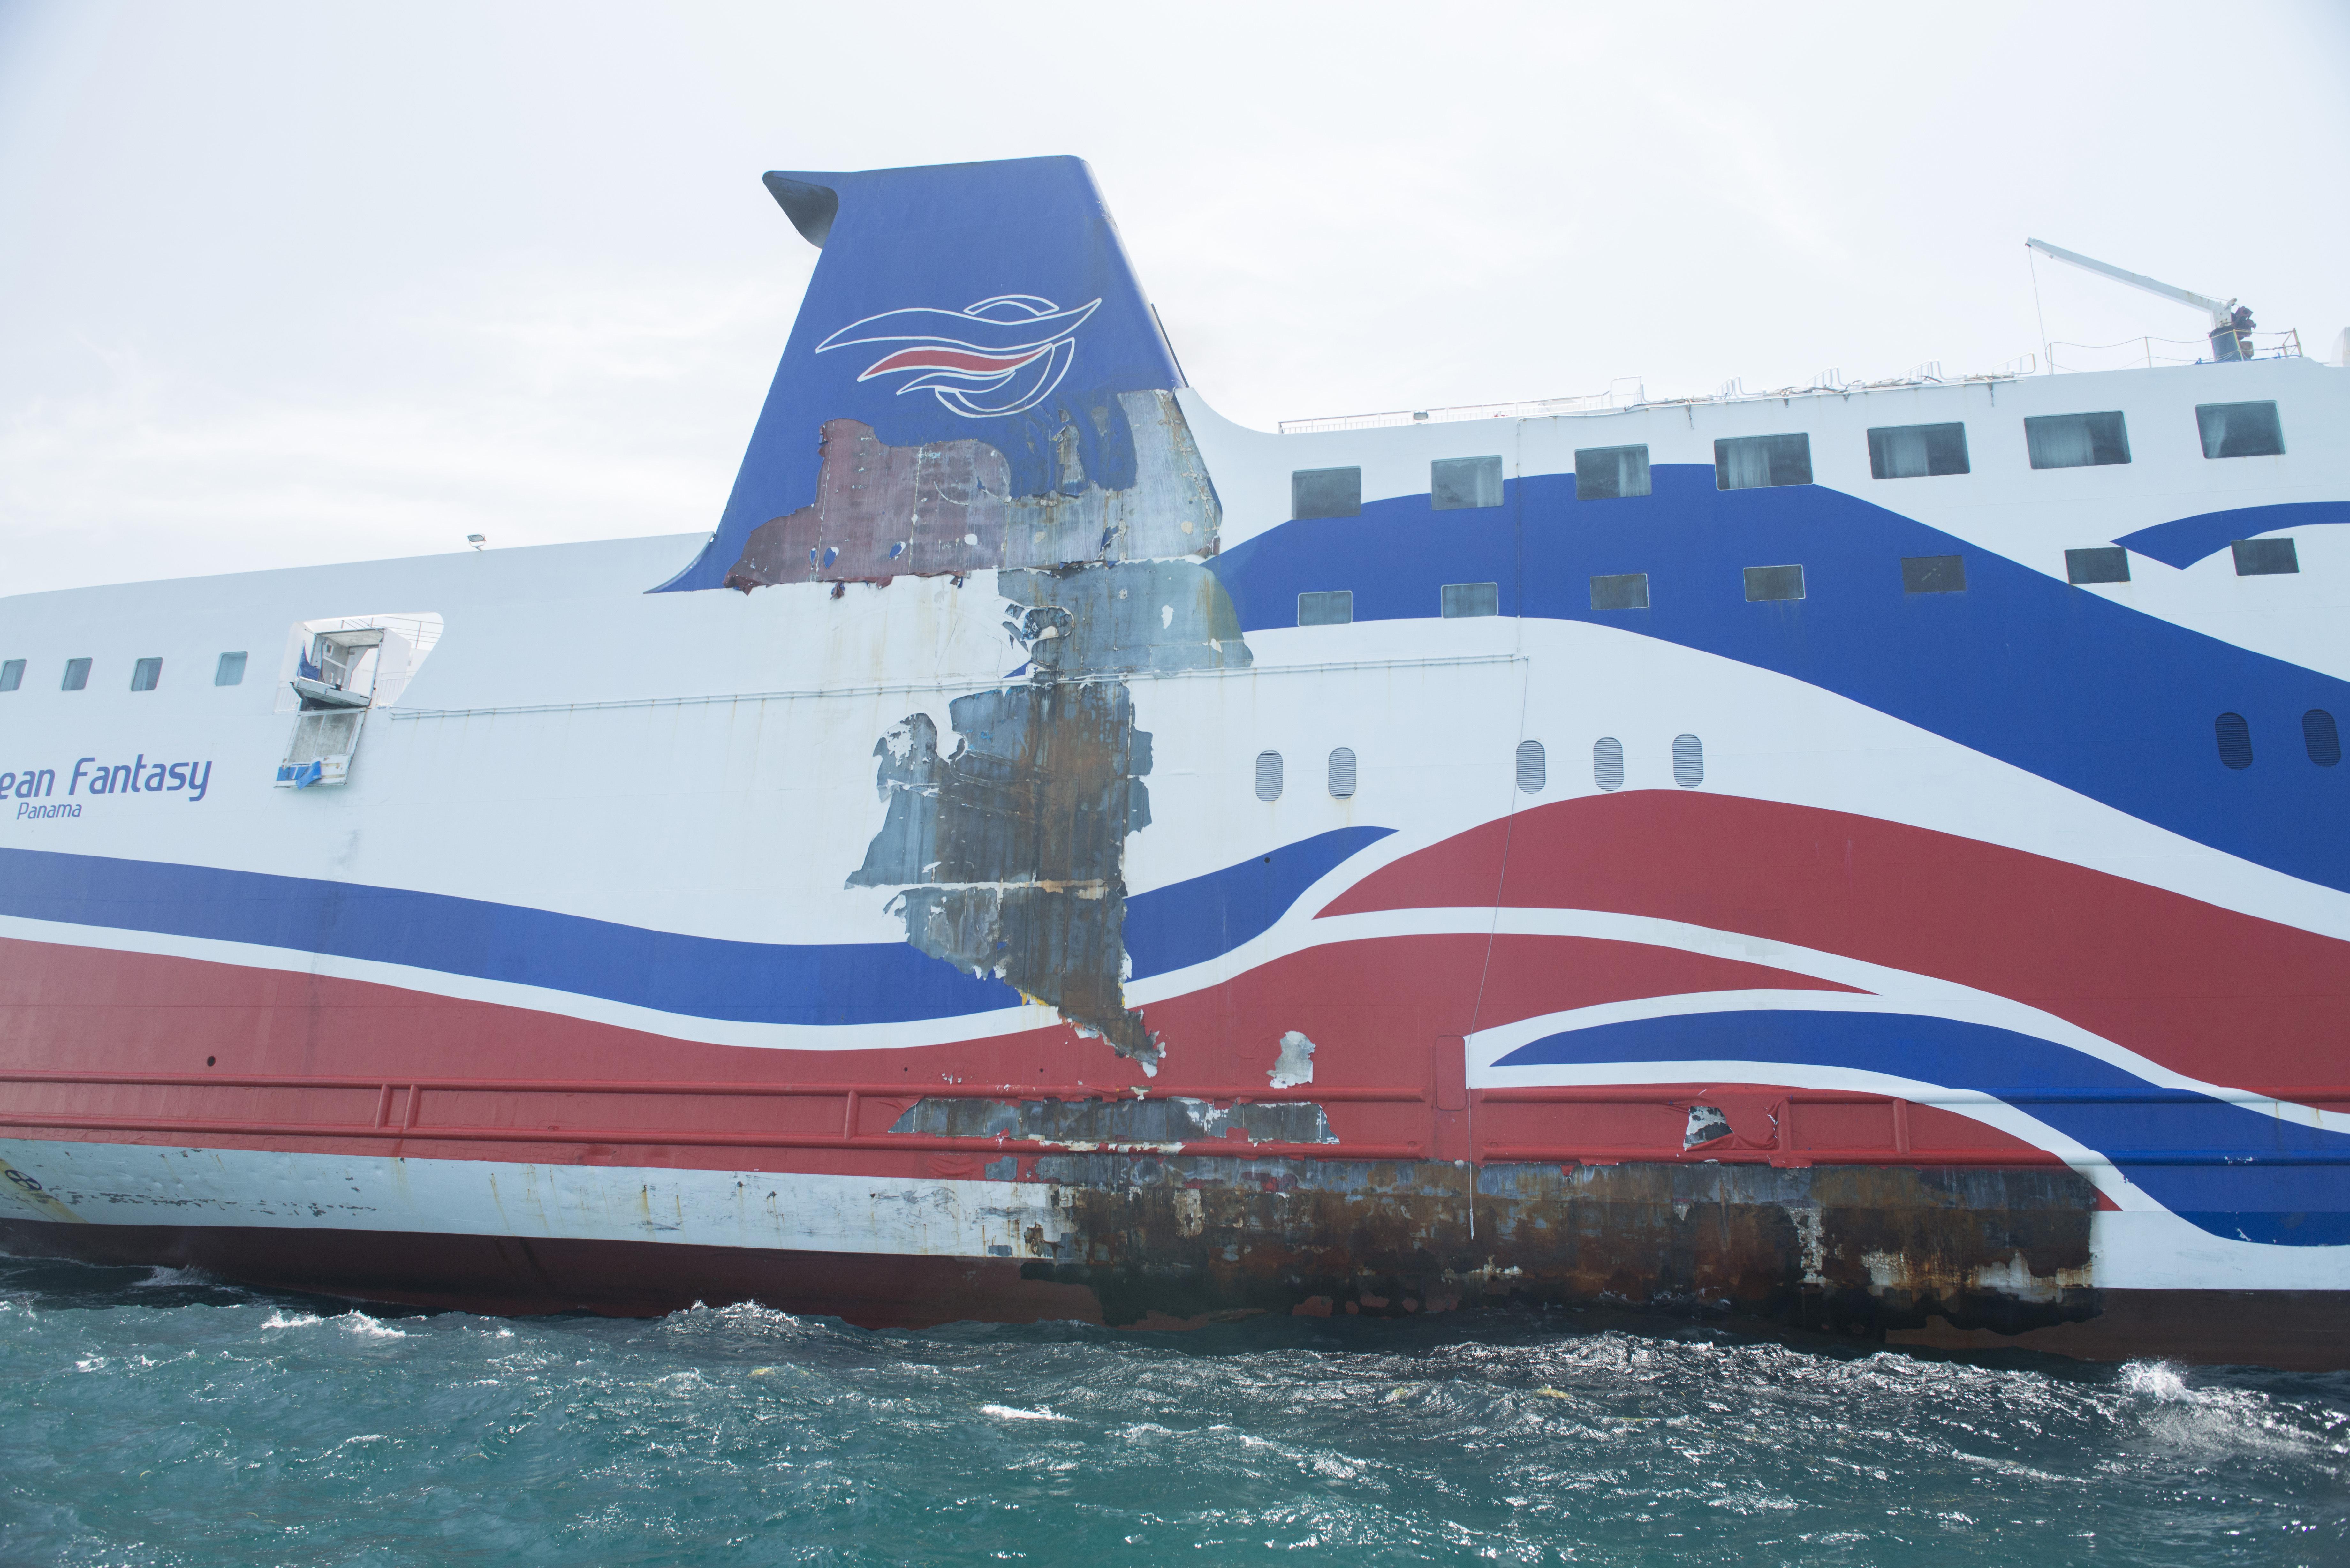 Caribbean Fantasy – Shipwreck Log